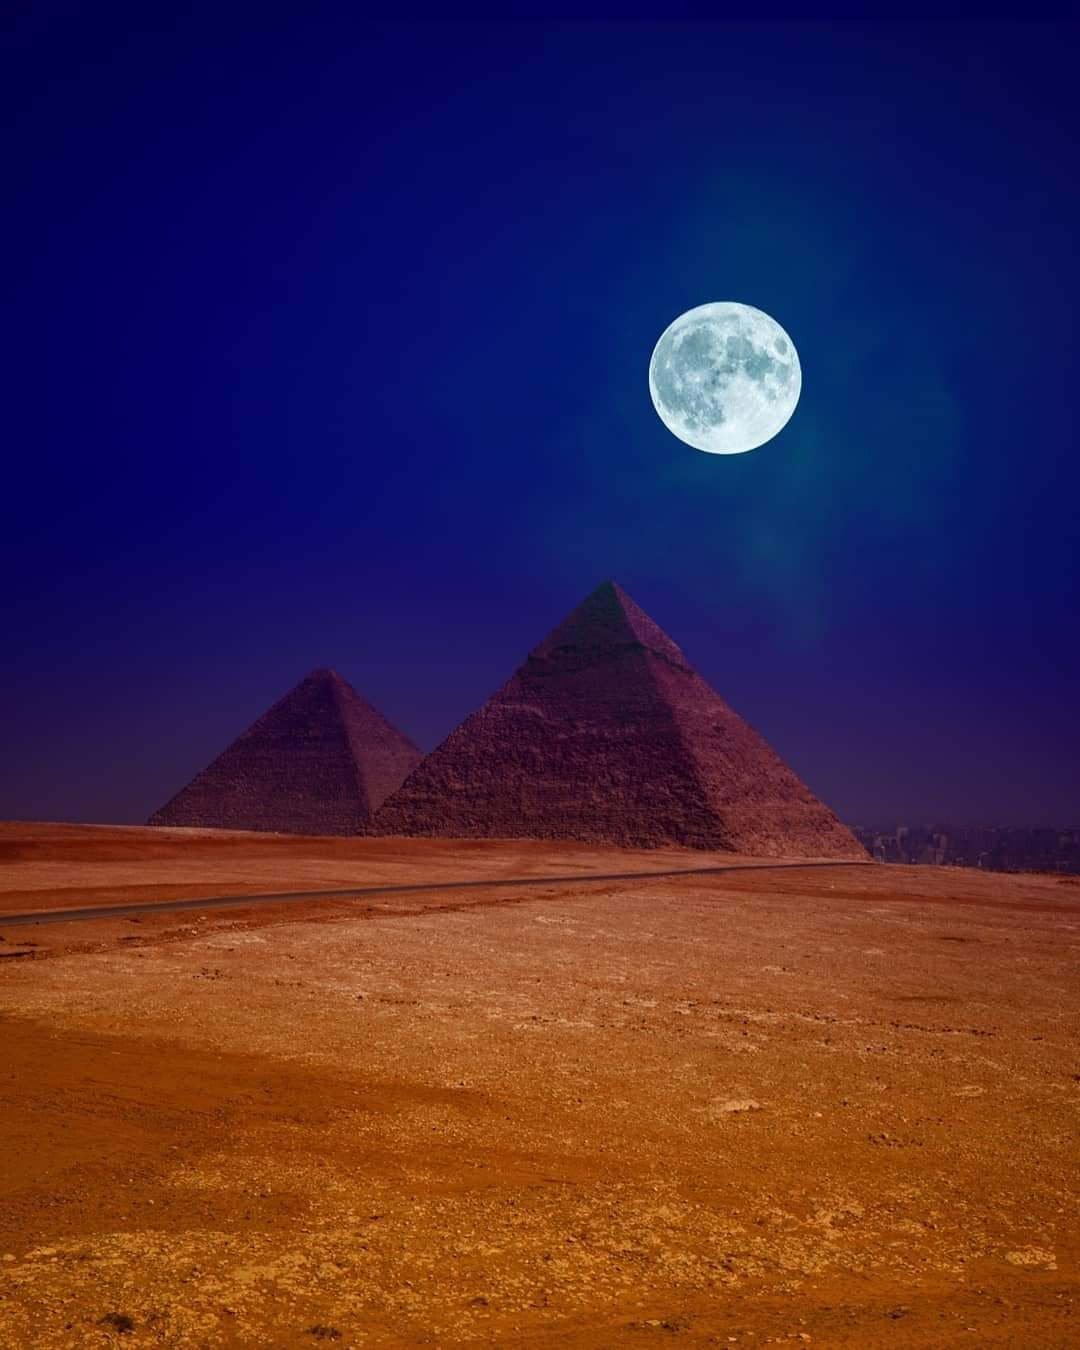 https://www.egyptravel4you.com/wp-content/uploads/2019/08/FB_IMG_1564346476144.jpg